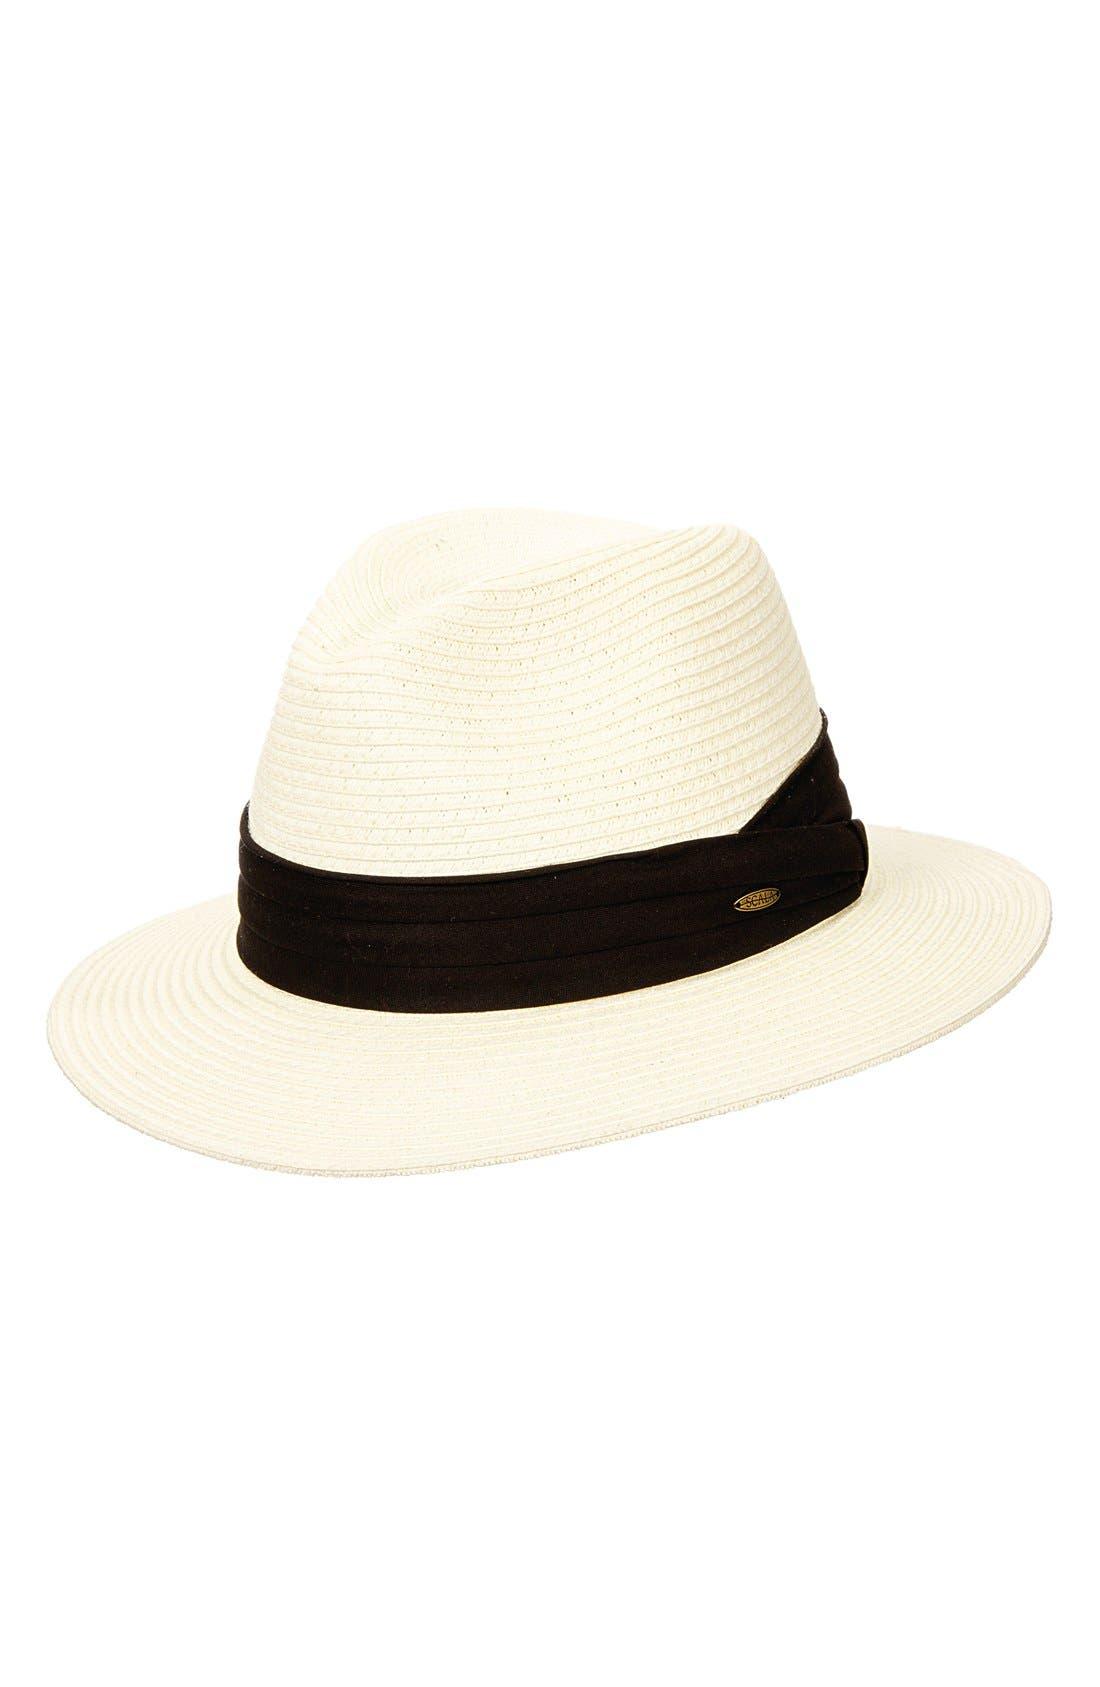 Safari Hat,                             Main thumbnail 1, color,                             Ivory